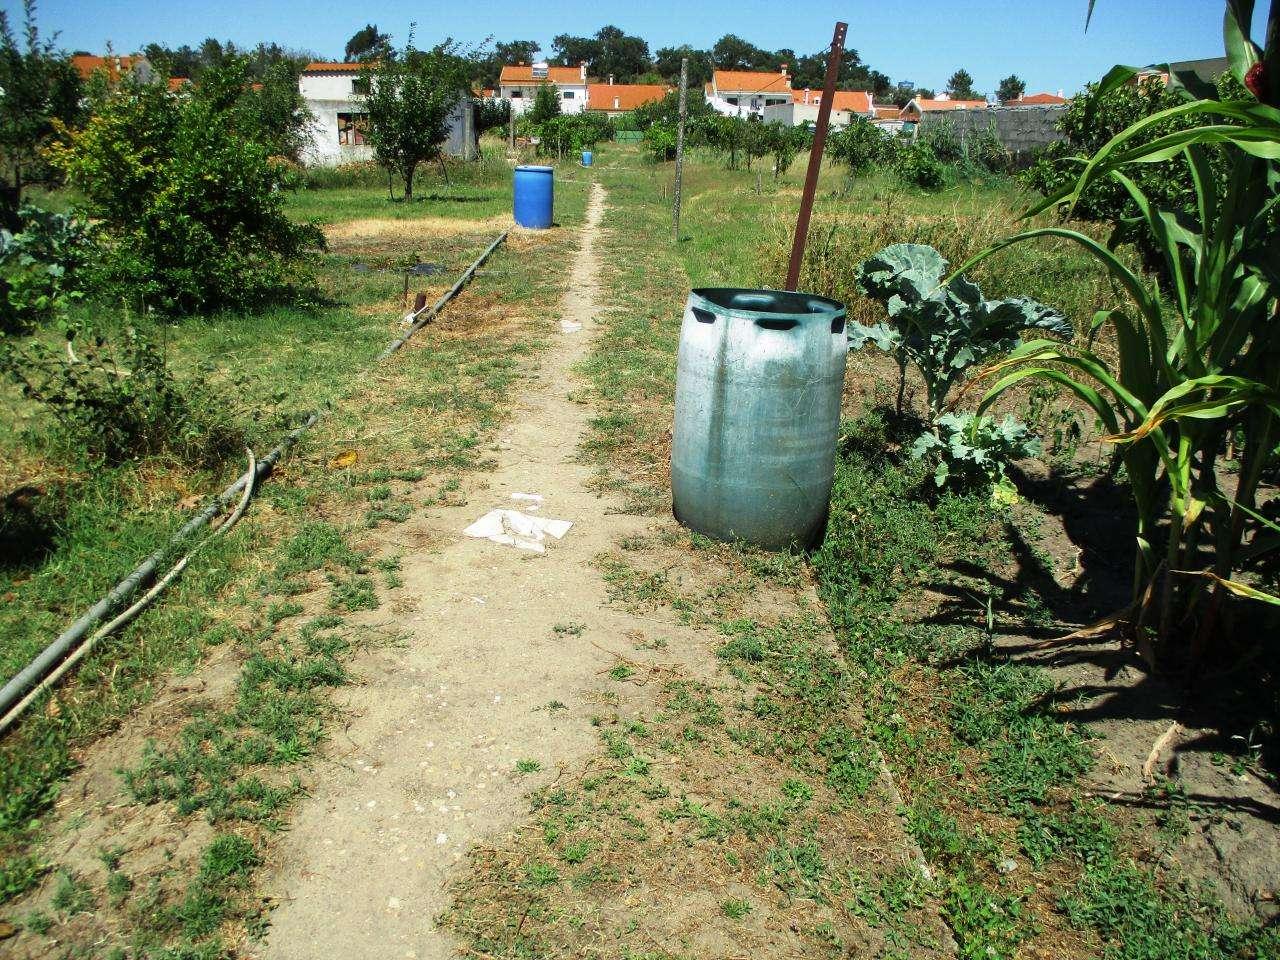 Terreno para comprar, Sado, Setúbal - Foto 3